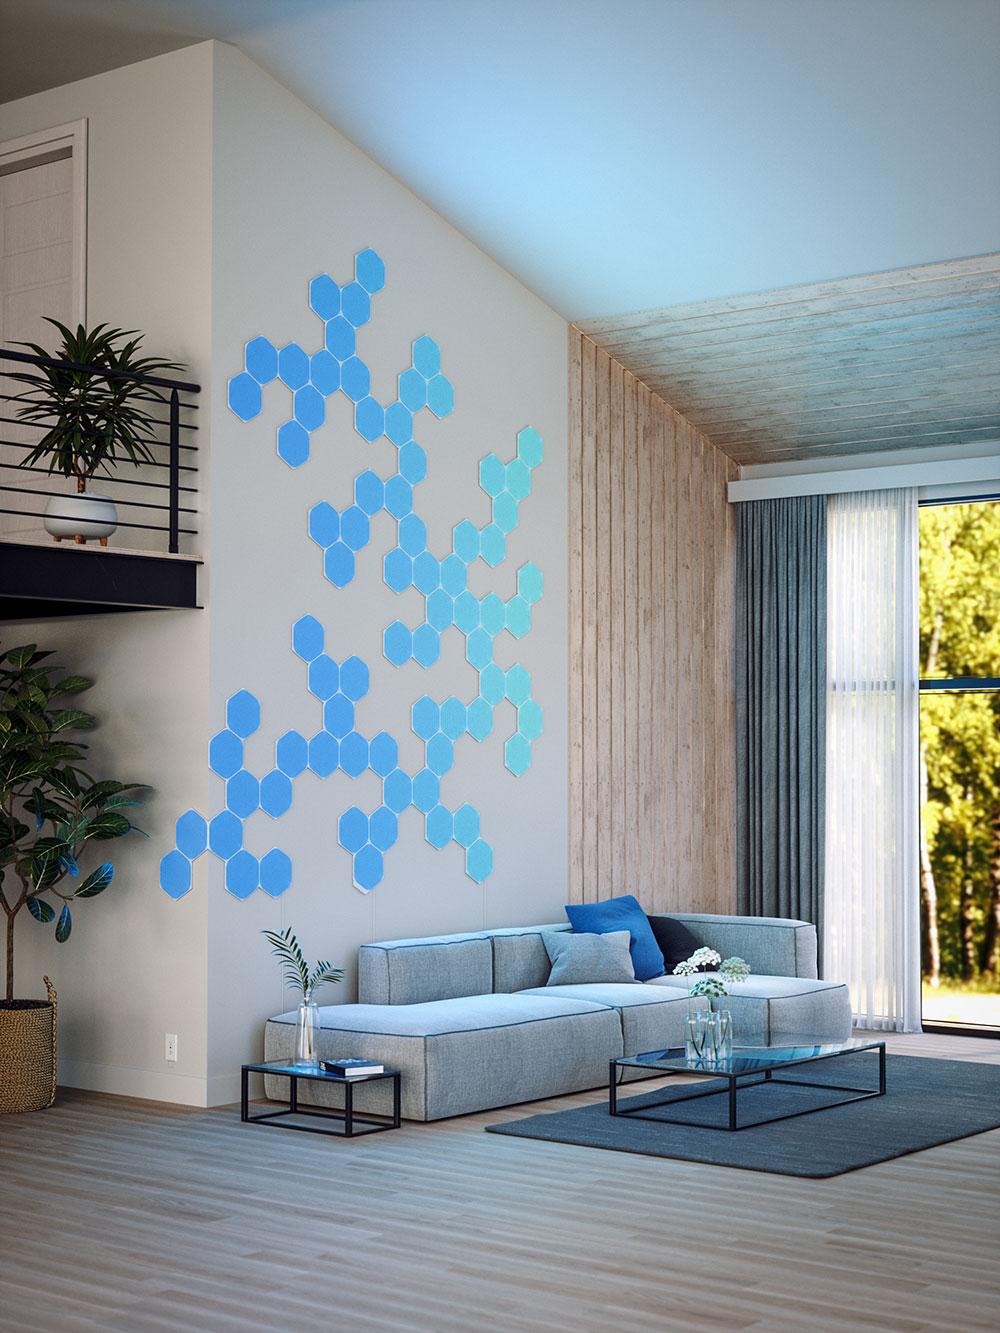 Nanoleaf Unified Hexagons Auf Wand